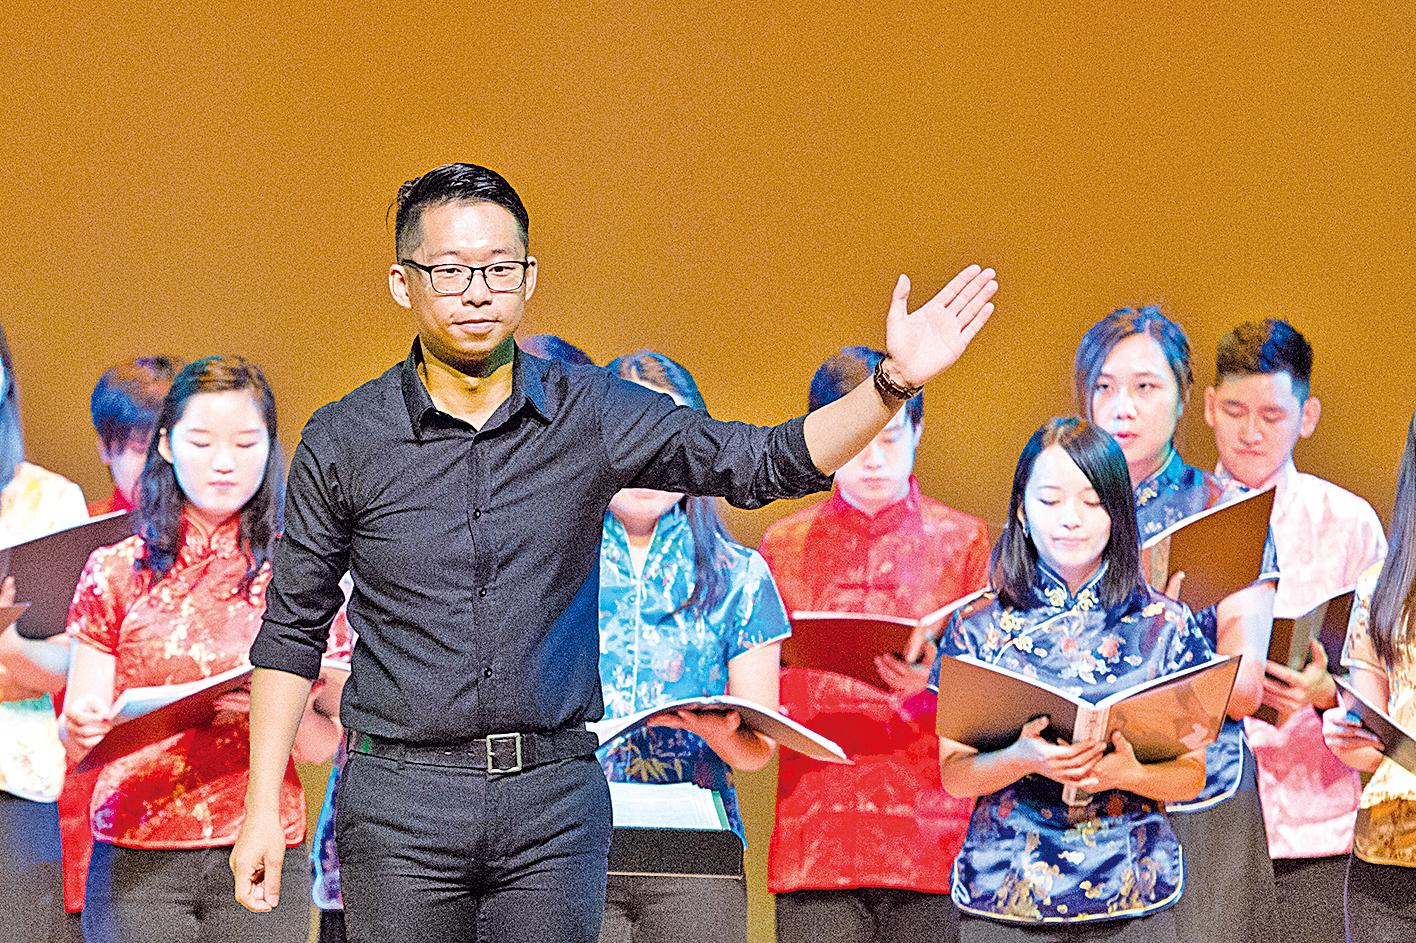 Ponte Singers 2017「聲•華」中國詩詞合唱音樂會現場。